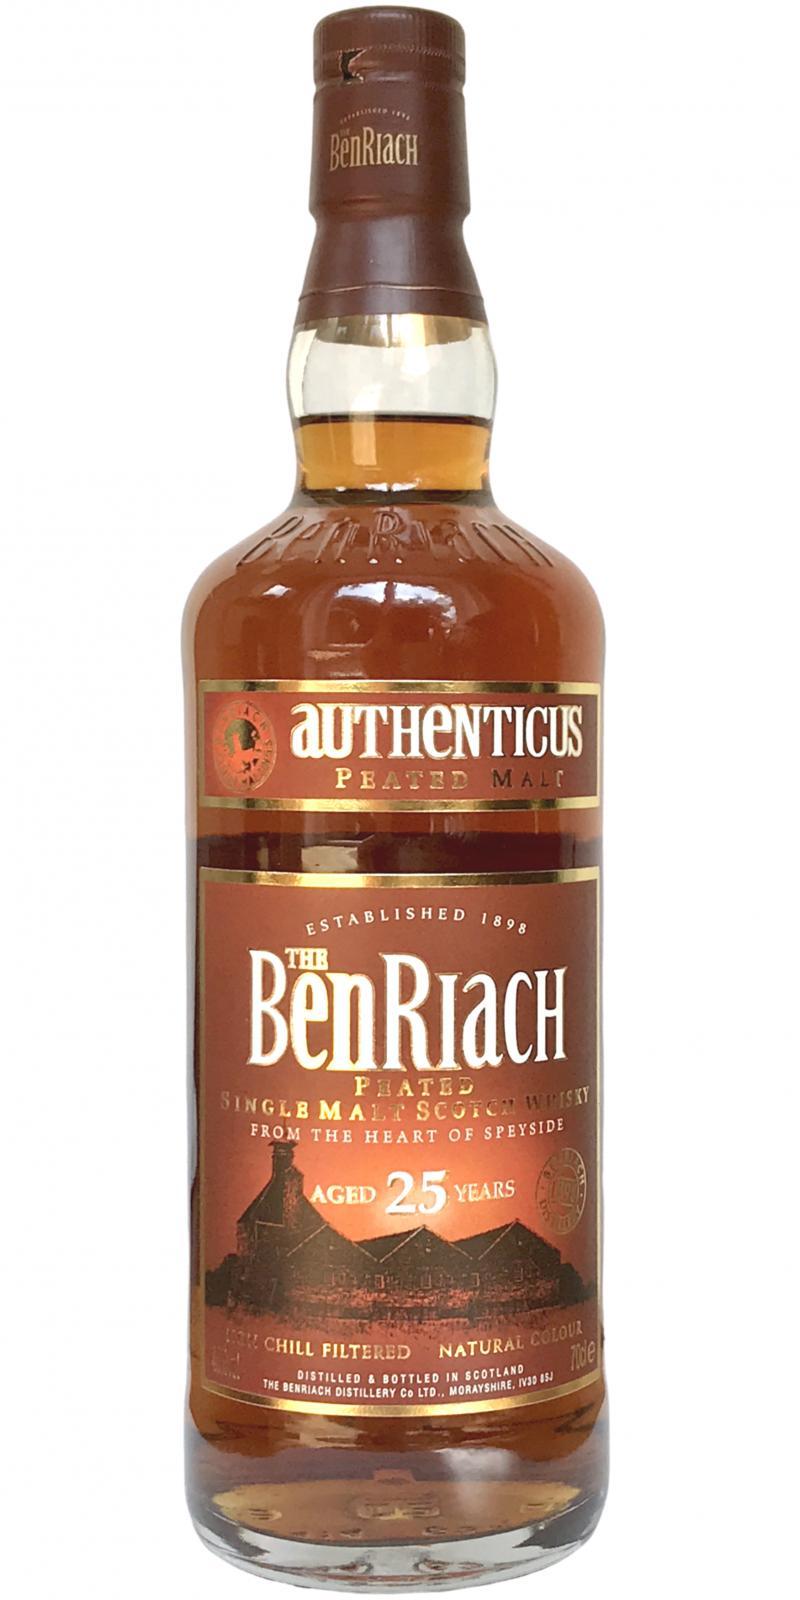 BenRiach Authenticus